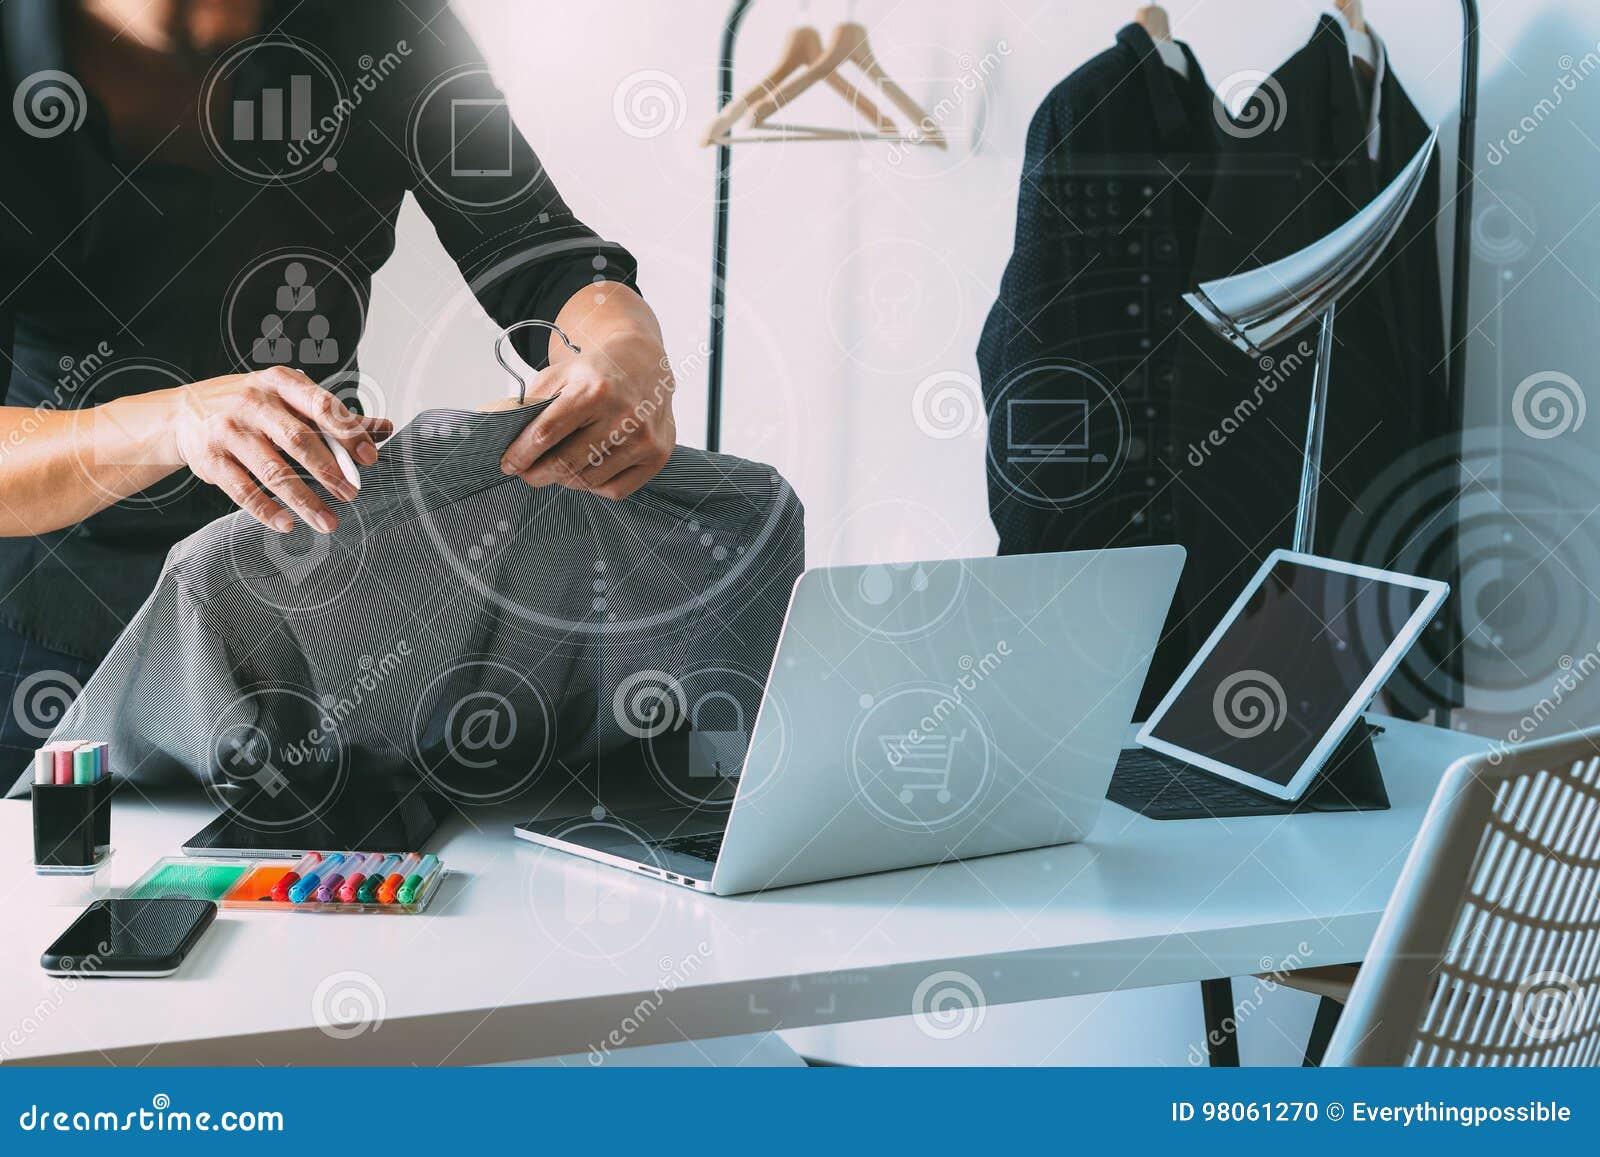 Fashion Designer Holding Shirt And Using Laptop With Digital Tab Stock Photo Image Of Background Desk 98061270